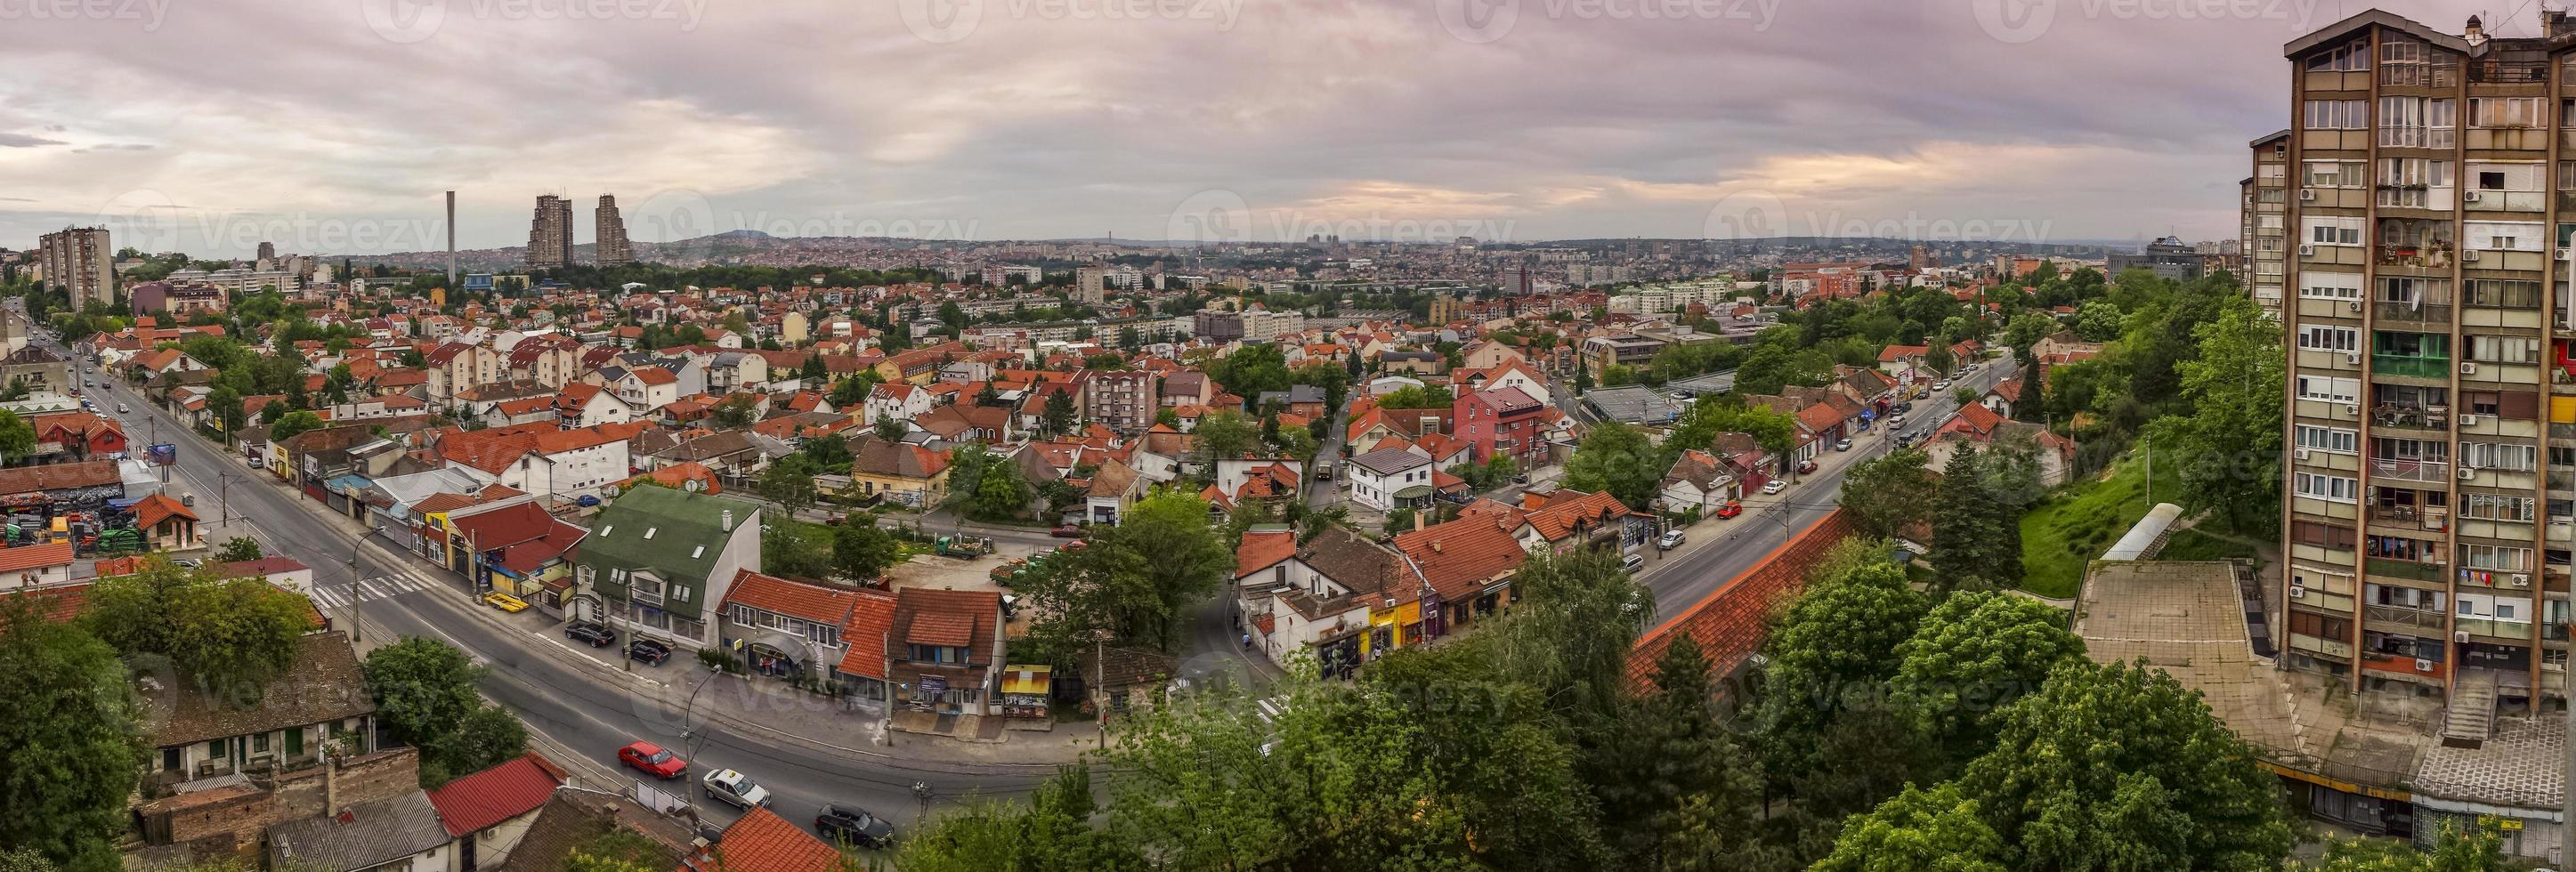 Belgrader Stadtbildpanorama mit schönem buntem Himmel foto